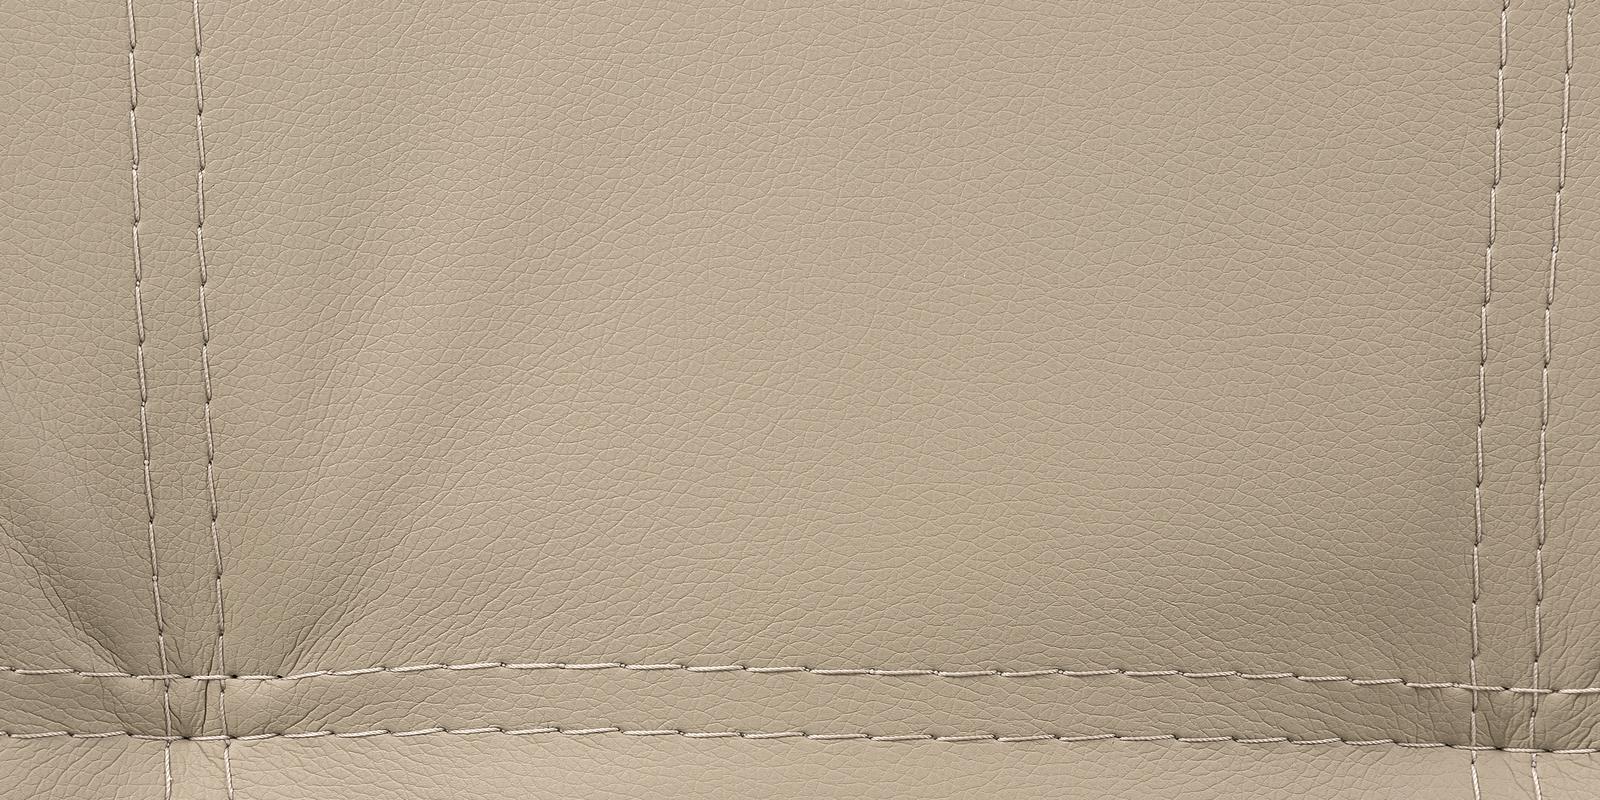 Диван тканевый угловой Атланта Luxe темно-бежевый вариант №3 (Экокожа) от HomeMe.ru